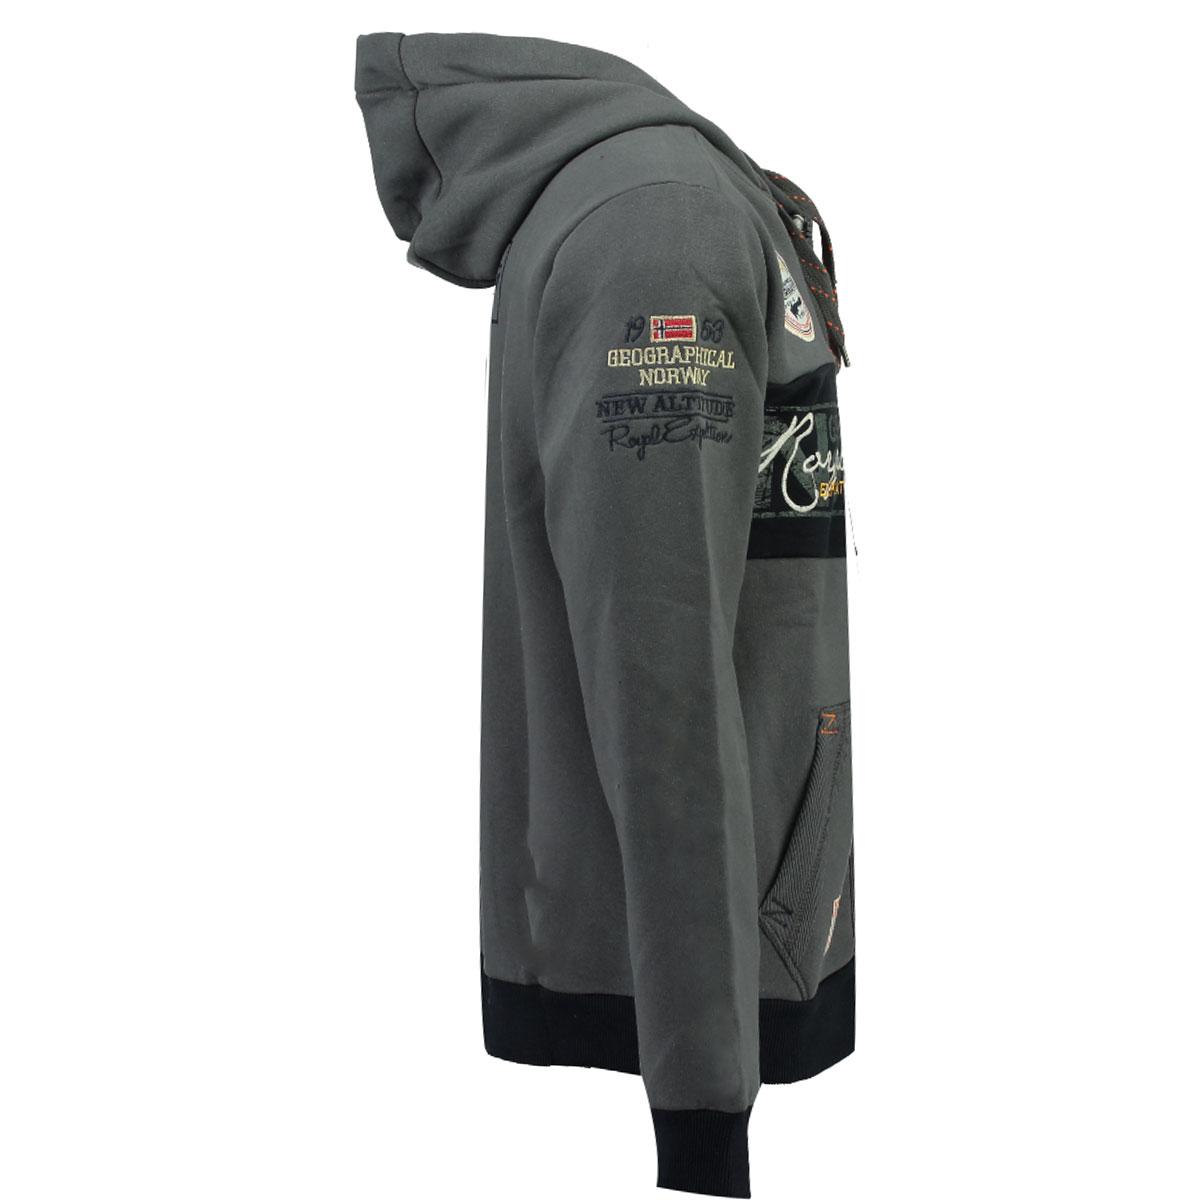 Geographical-Norway-giacca-uomo-autunno-inverno-S-fino-a-3xl-Felpa miniatura 4